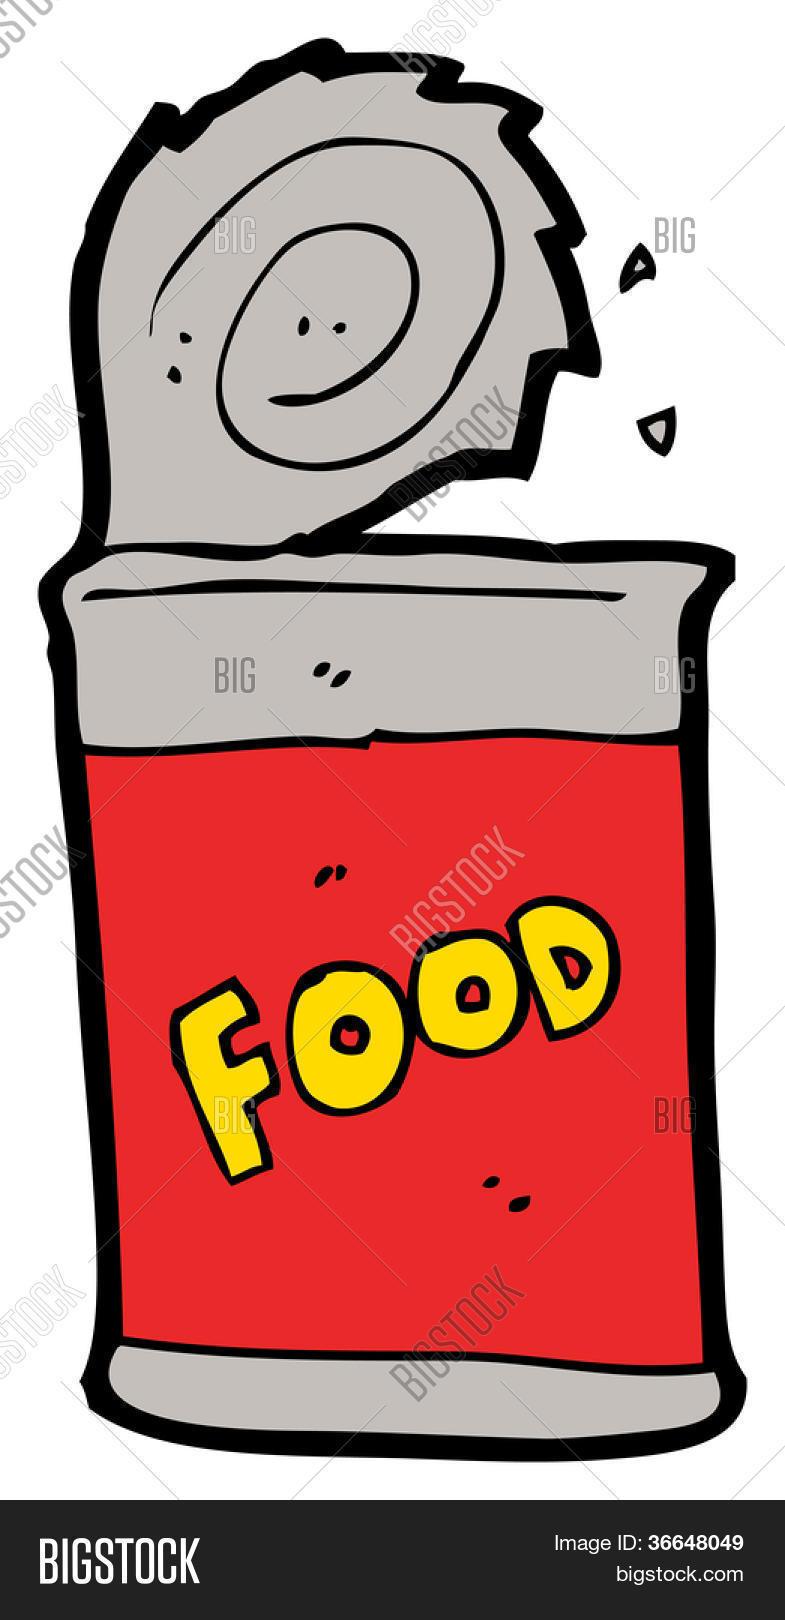 Cartoon Canned Food Image & Photo | Bigstock